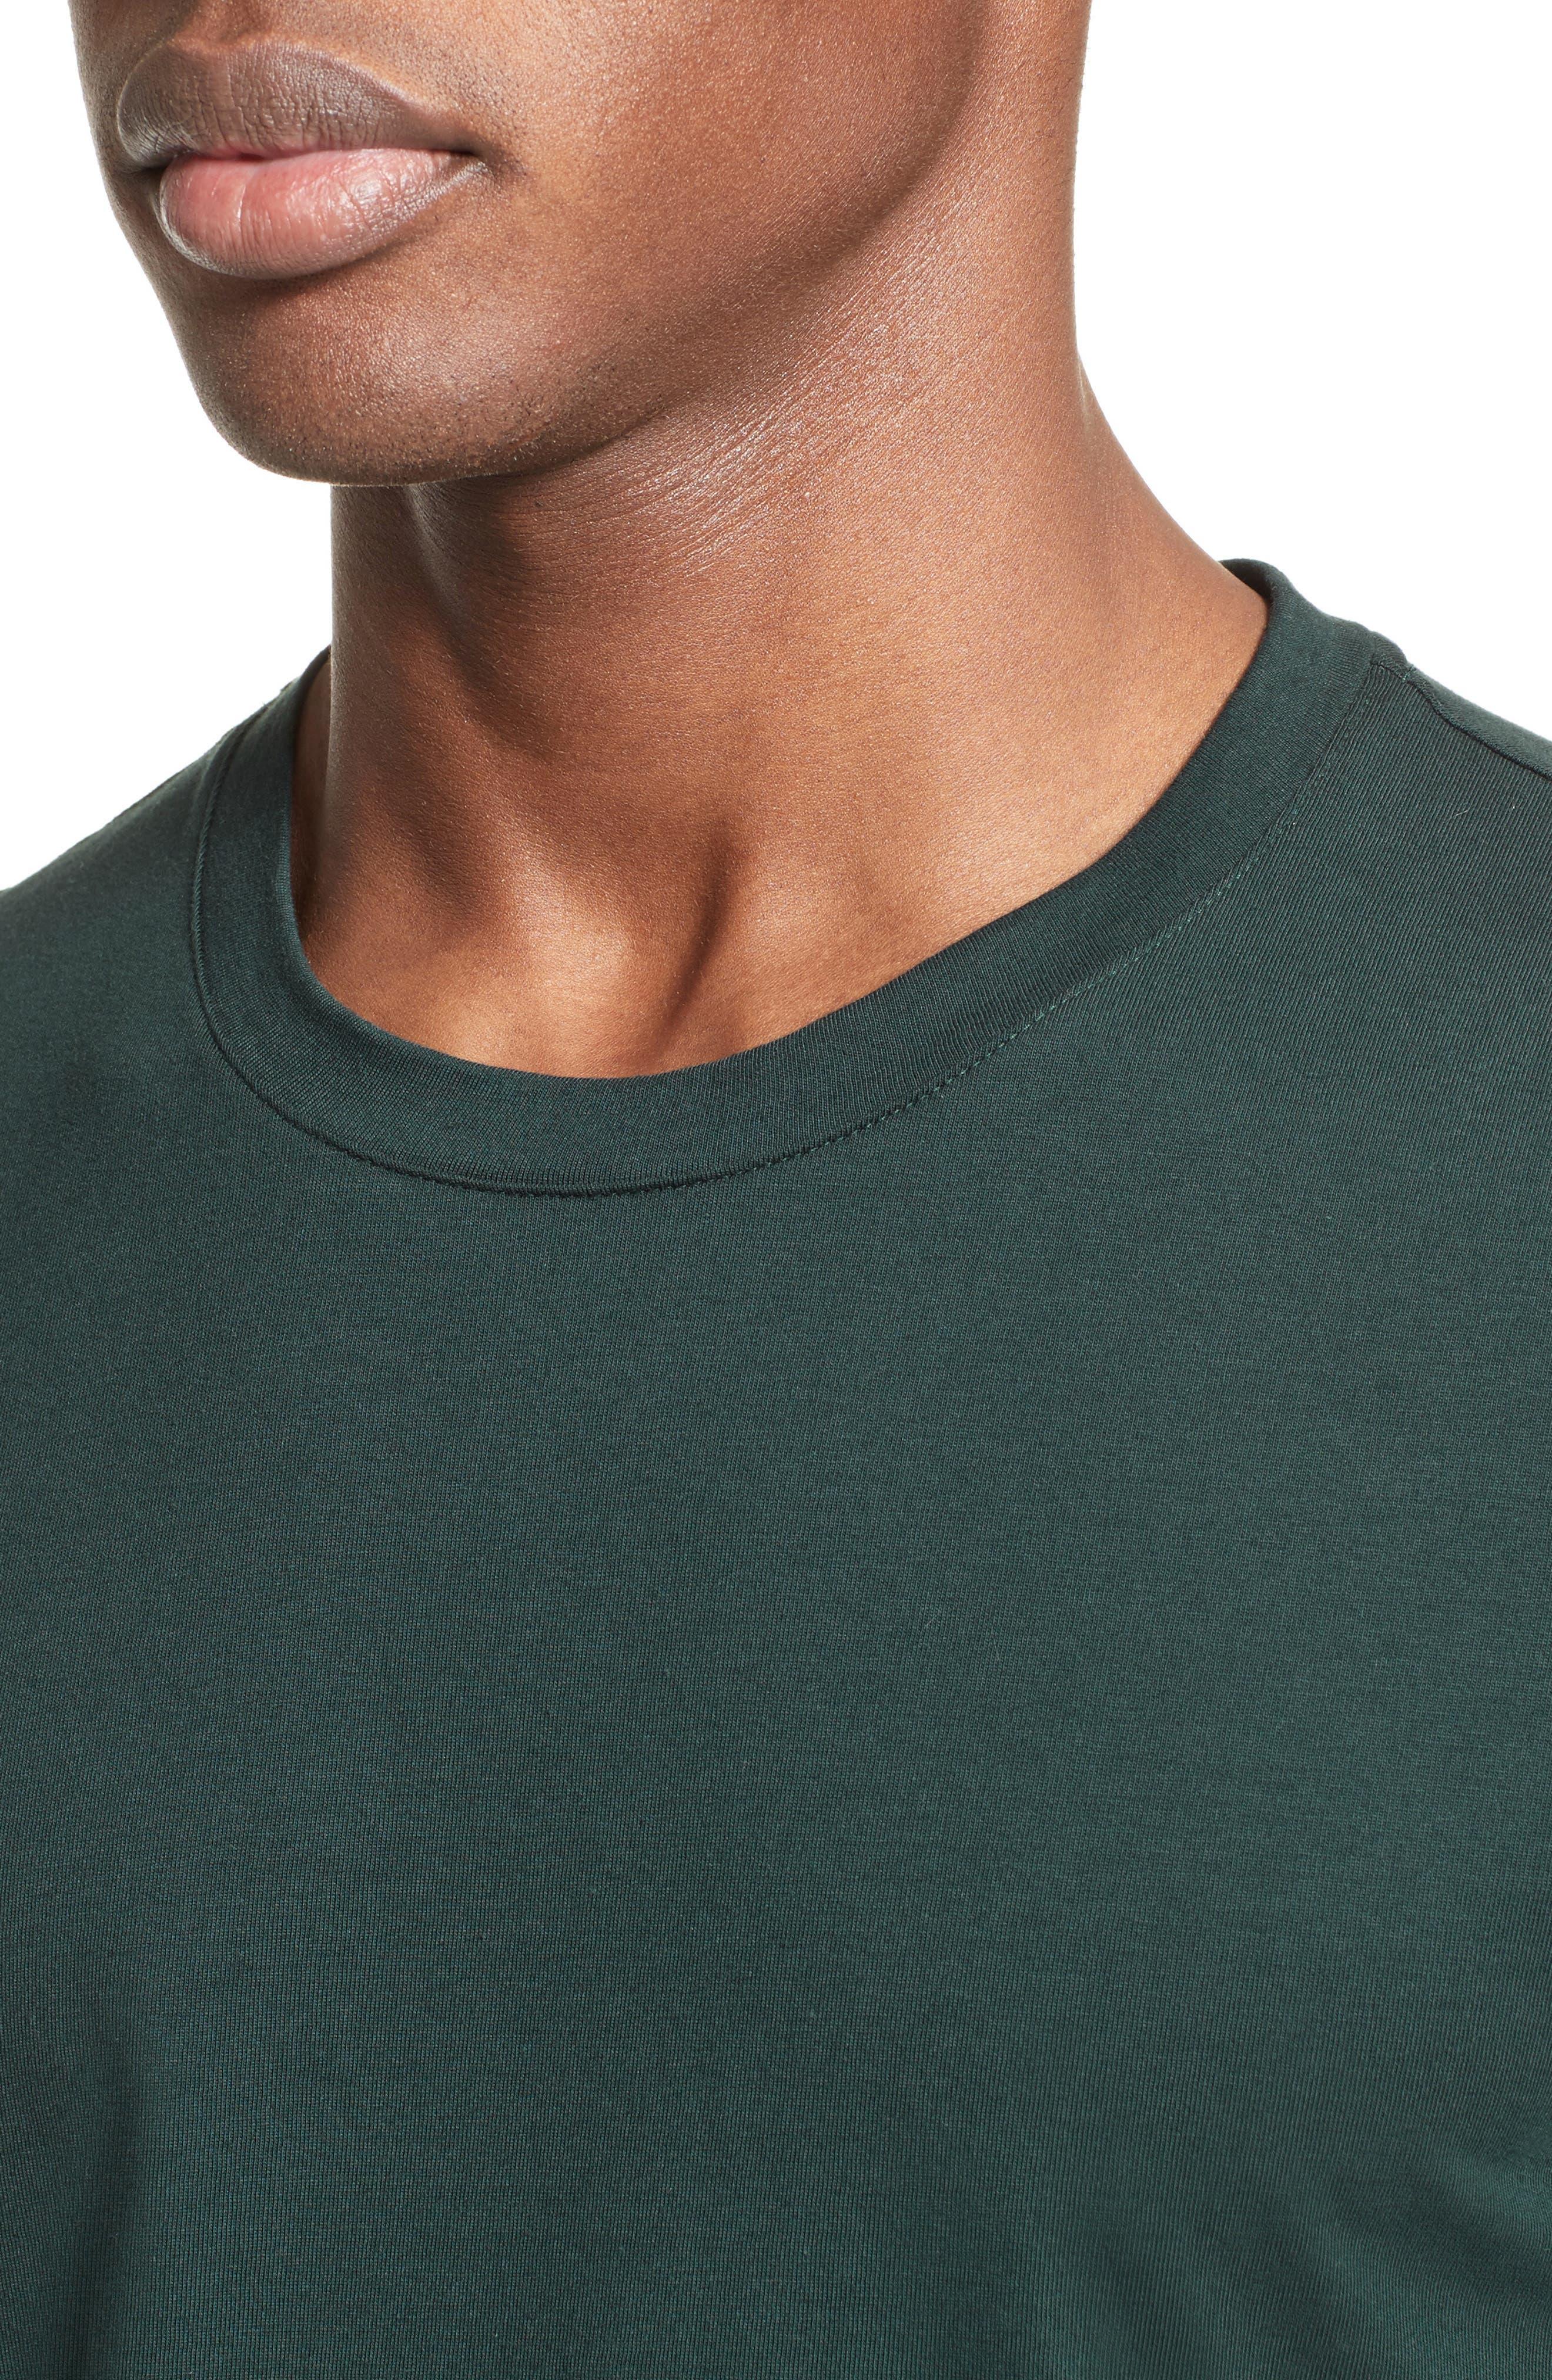 Medusa Foil Back T-Shirt,                             Alternate thumbnail 4, color,                             300